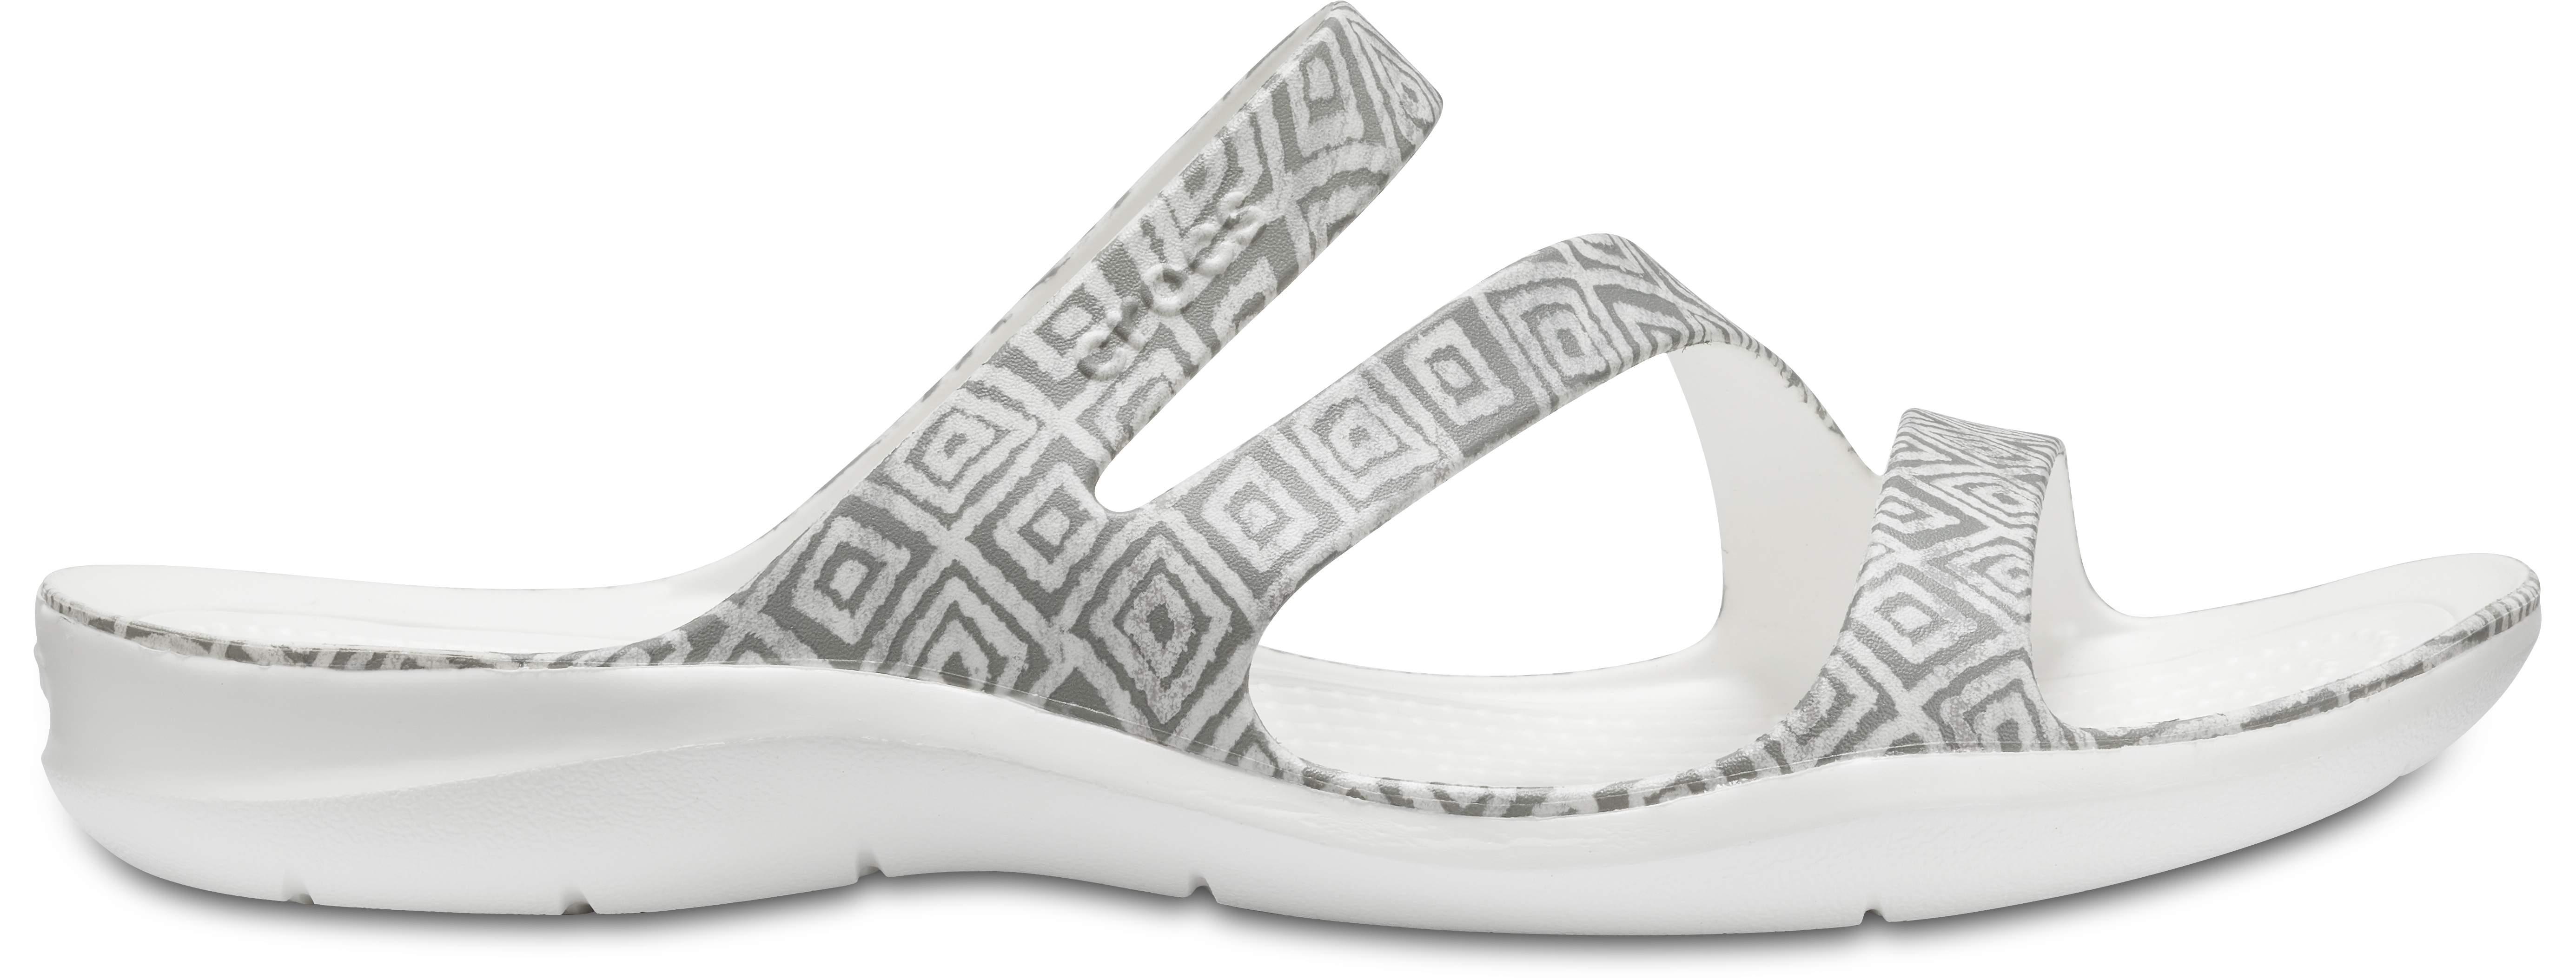 Crocs Women'S Swiftwater Graphic Slip on Sandal Grey Diamond/White-Grey-7 Size 7